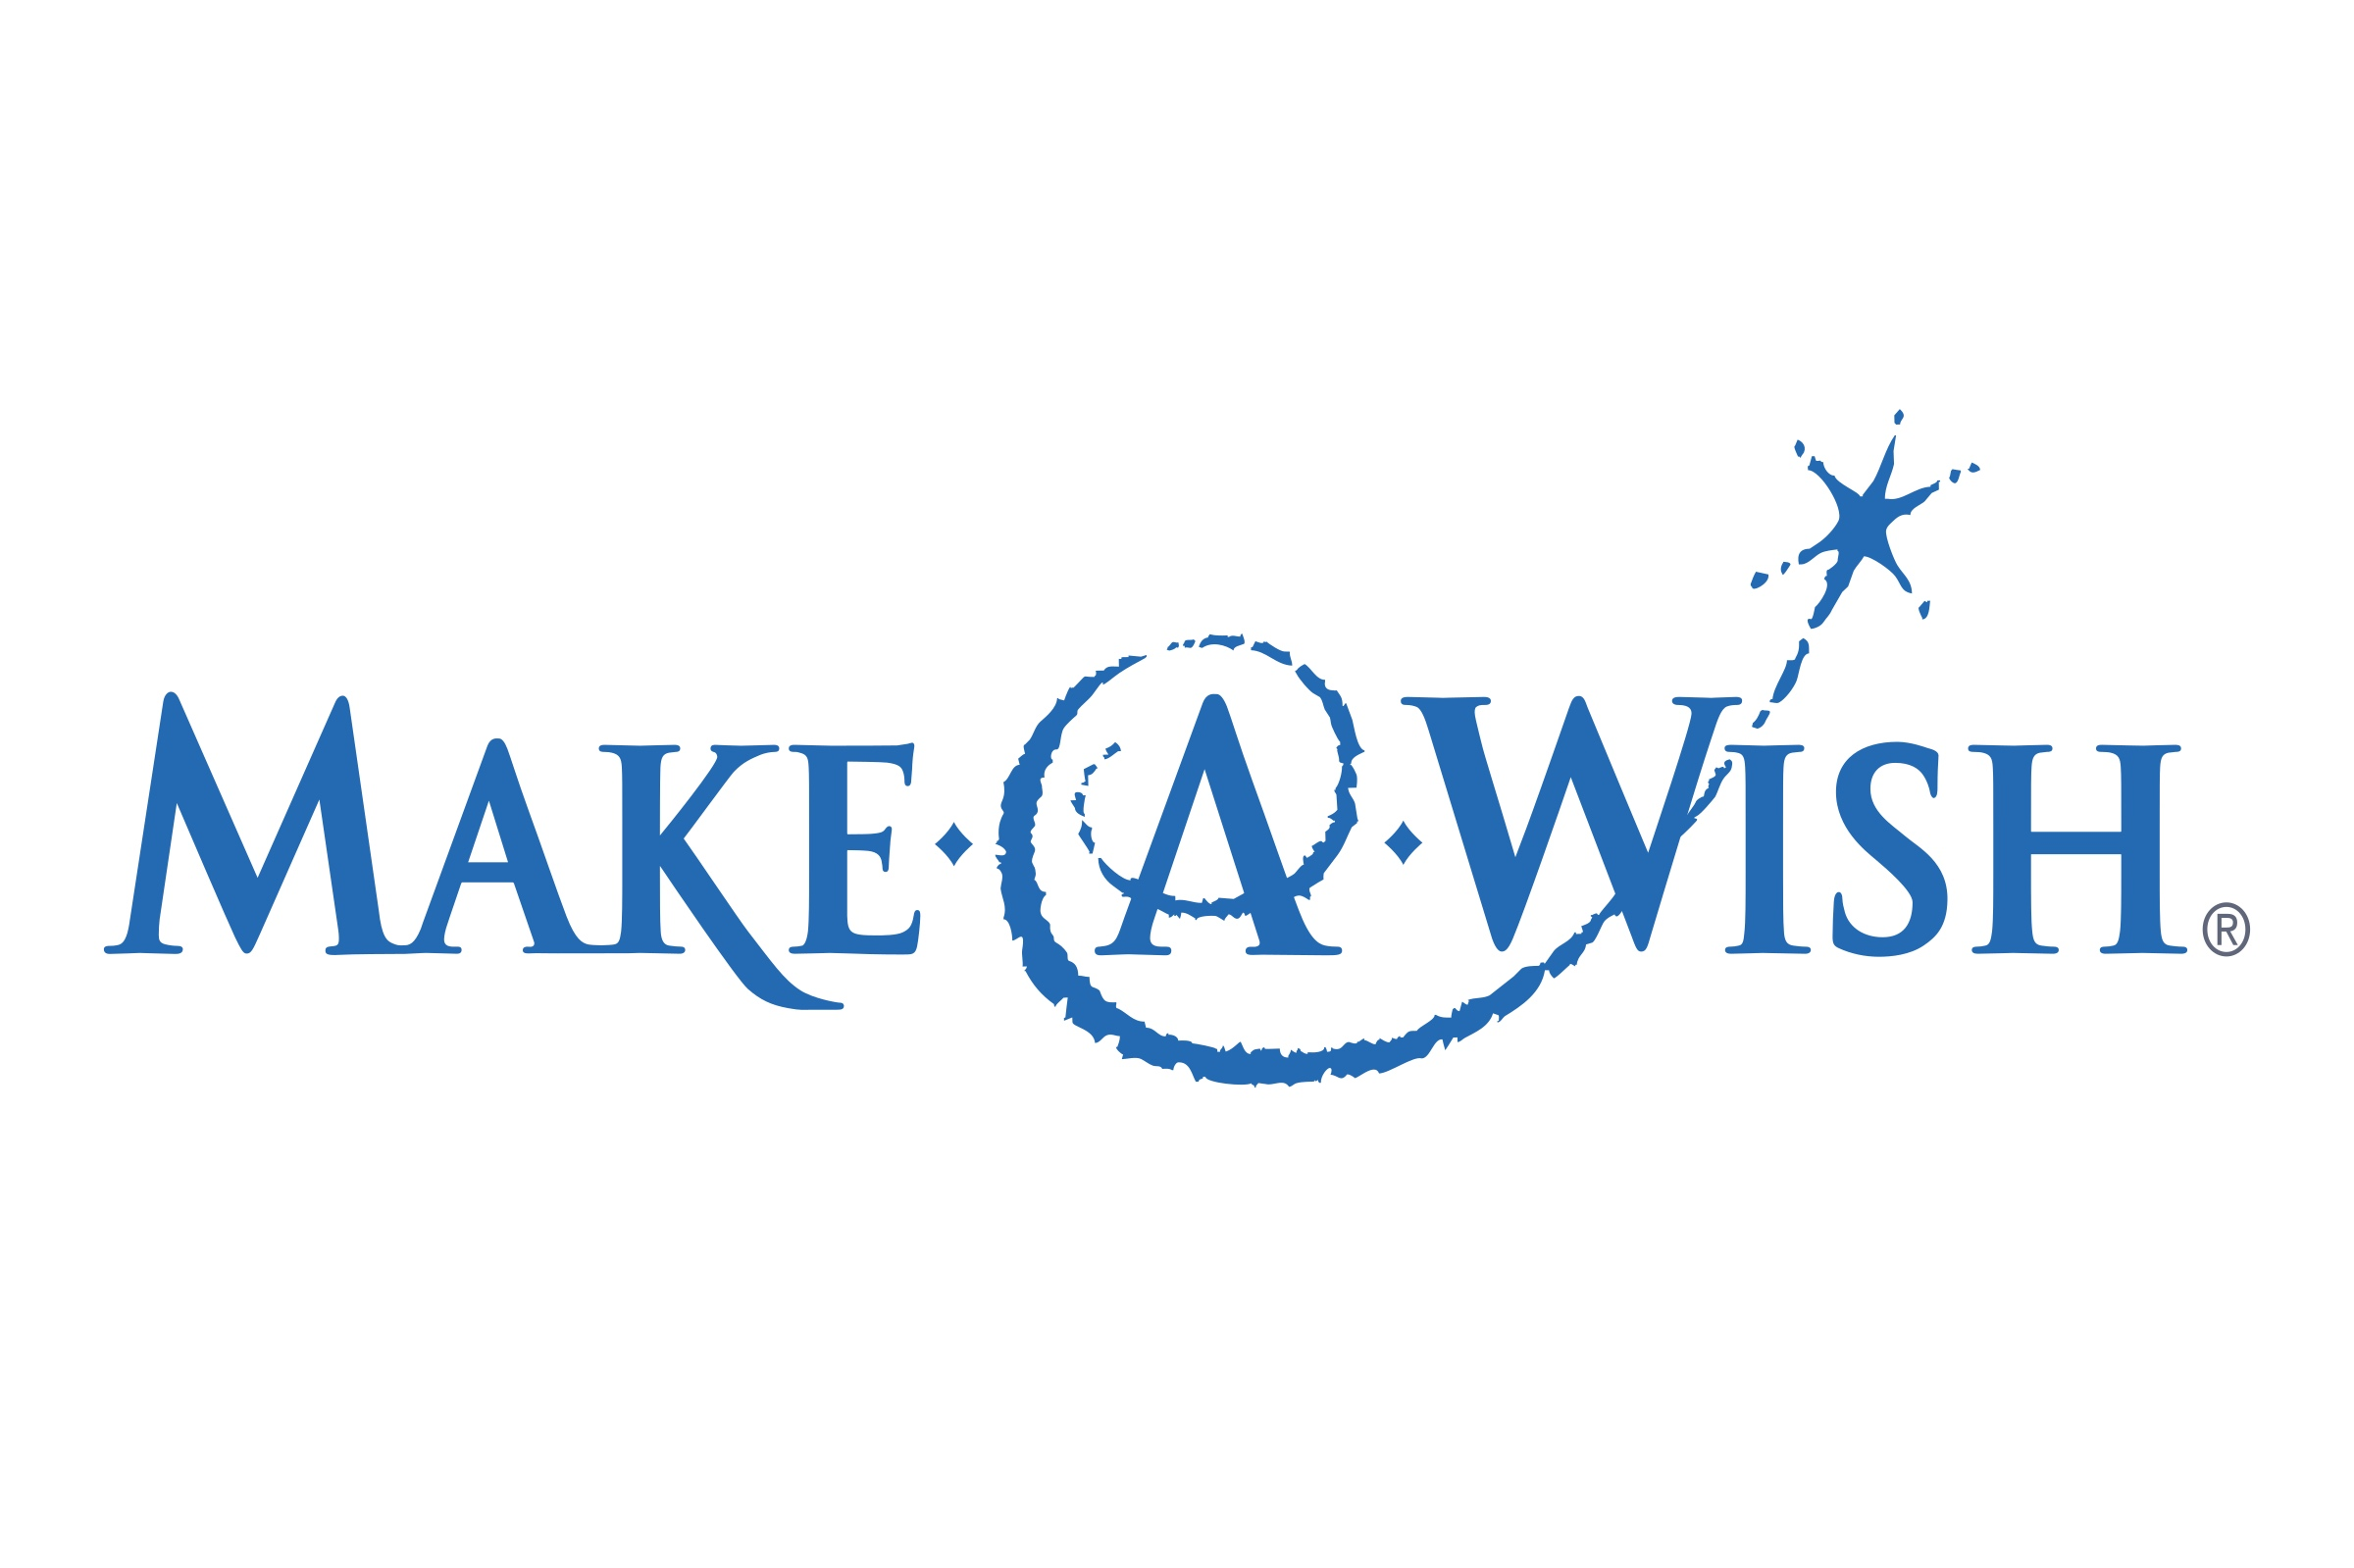 Make+A+wish+logo.jpg